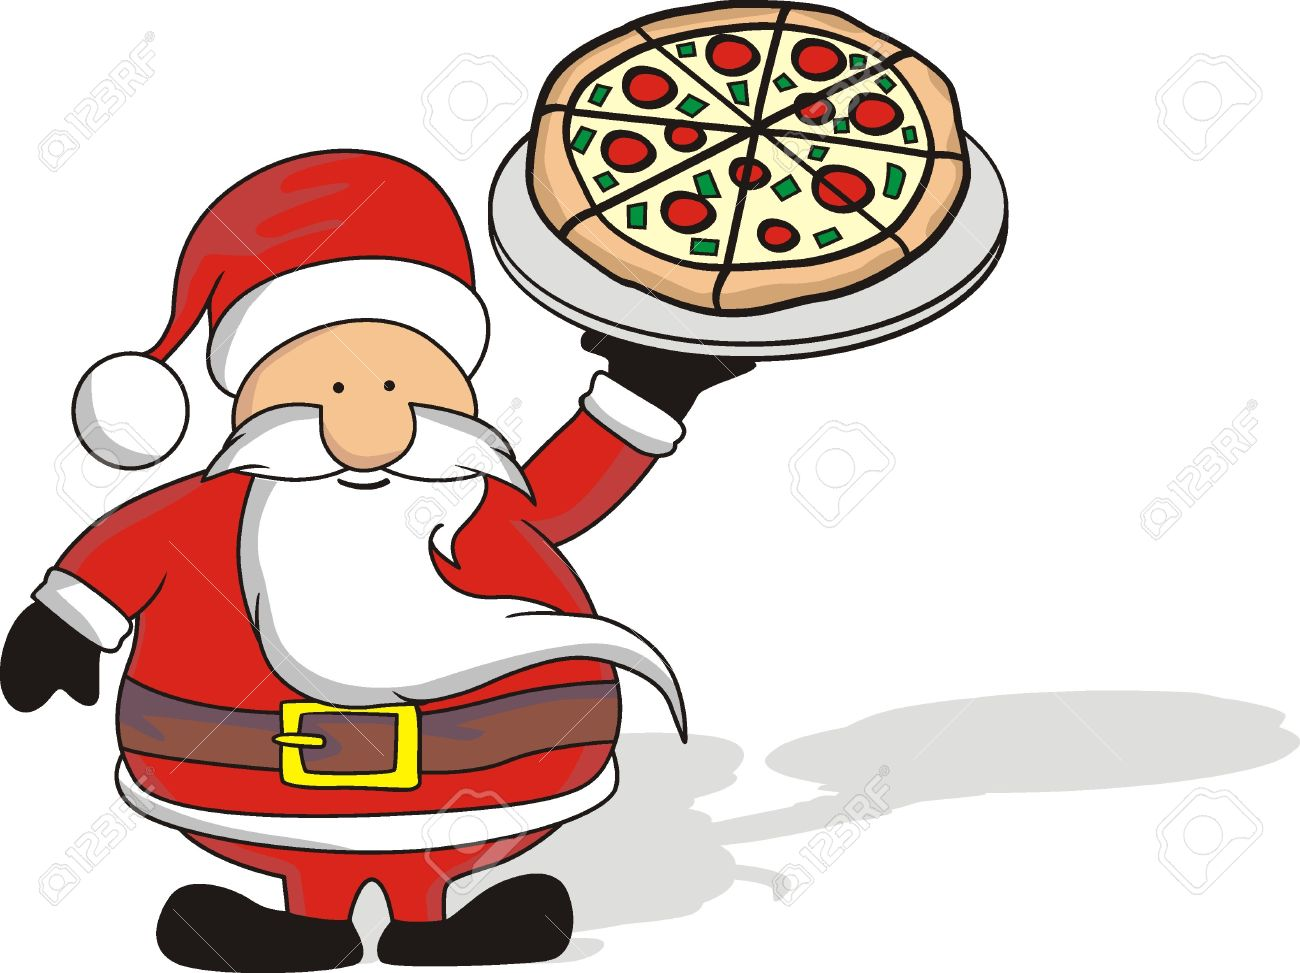 1300x973 Santa Clipart Pizza